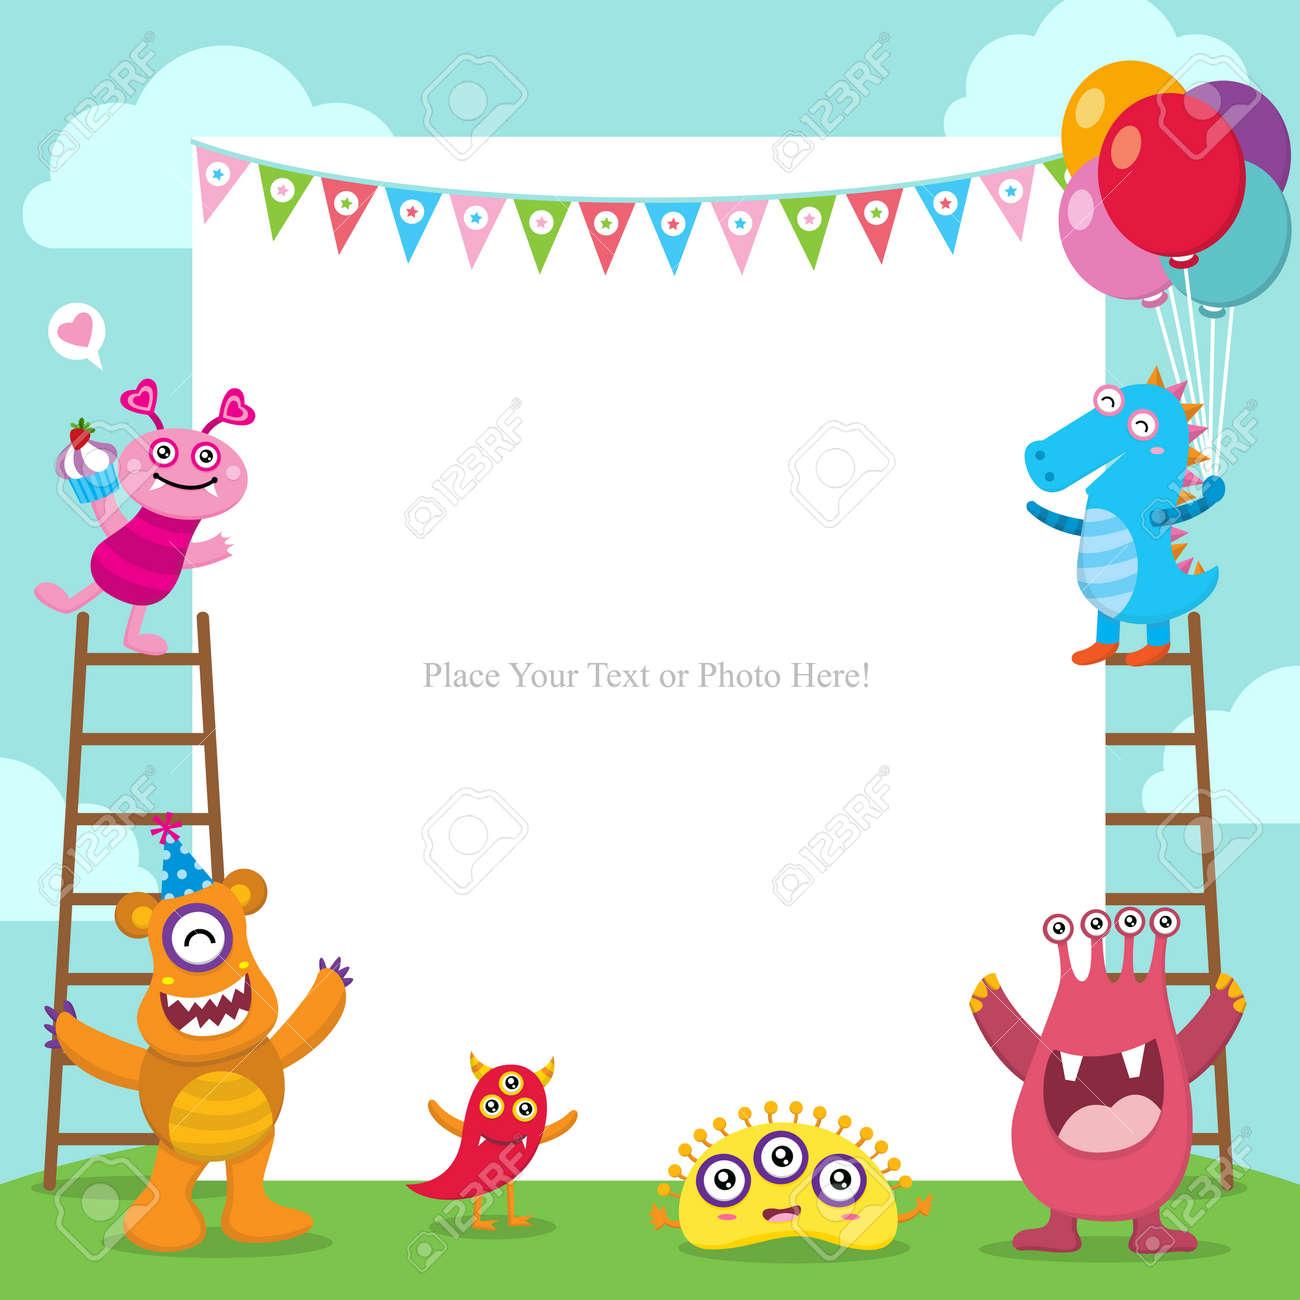 Cute monsters birthday card invitation royalty free cliparts cute monsters birthday card invitation stock vector 57471294 filmwisefo